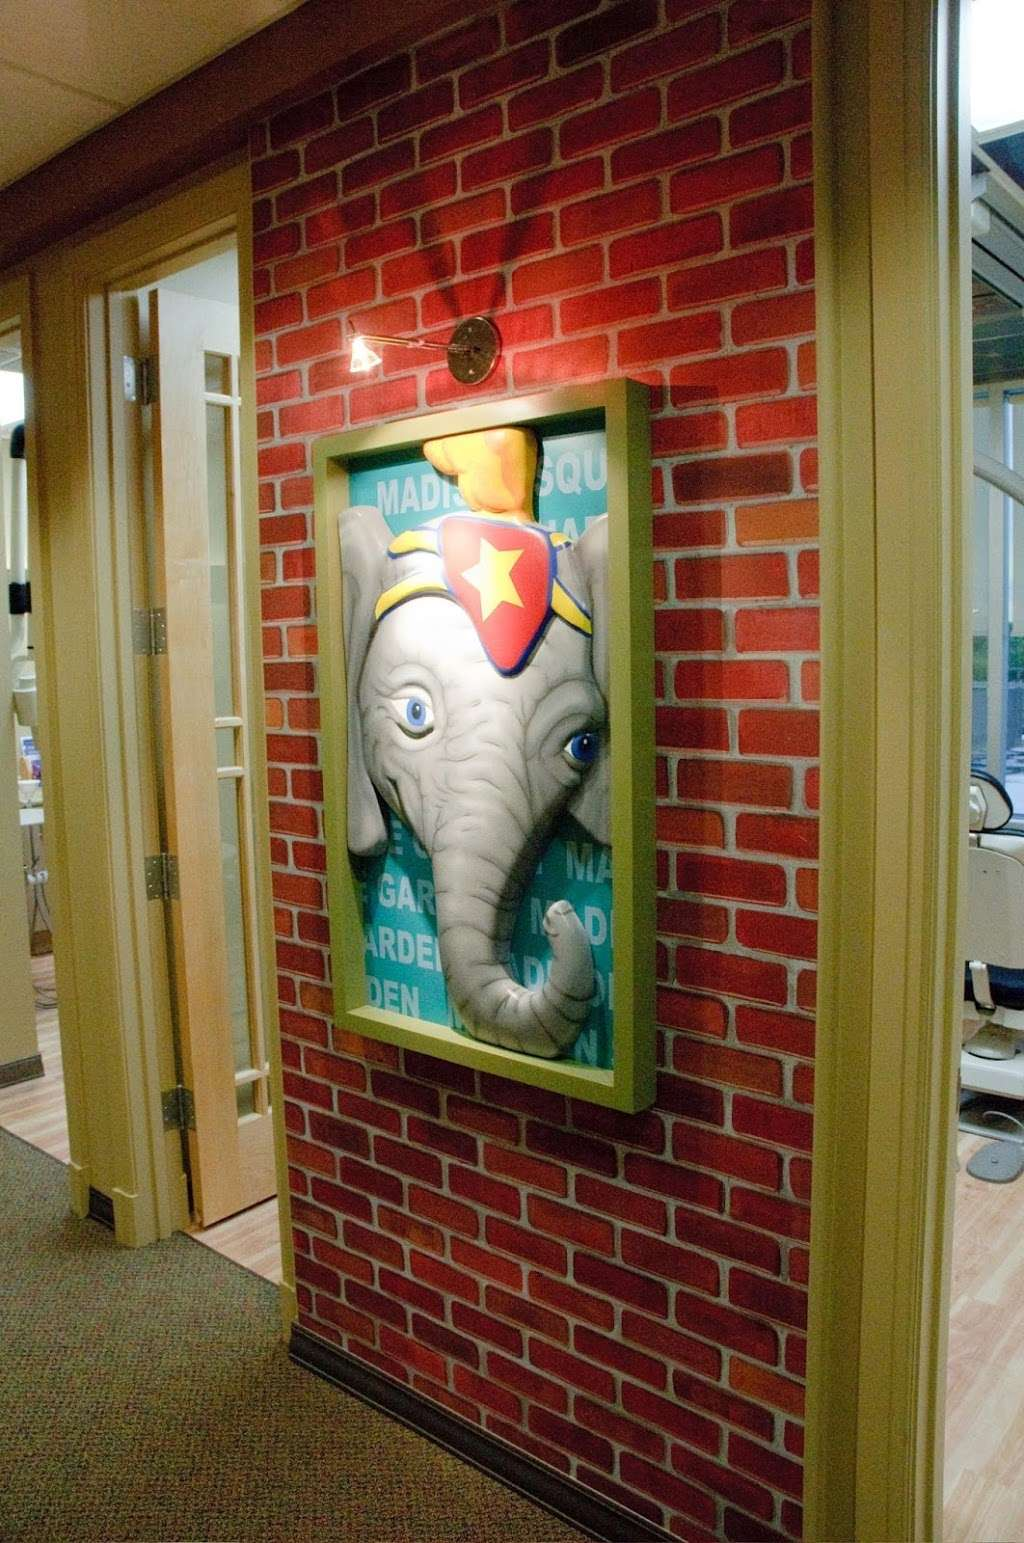 Kid Island Dental at Great Neck Dental Associates - dentist  | Photo 2 of 8 | Address: 611 Northern Blvd #100, Great Neck, NY 11021, USA | Phone: (516) 487-5500